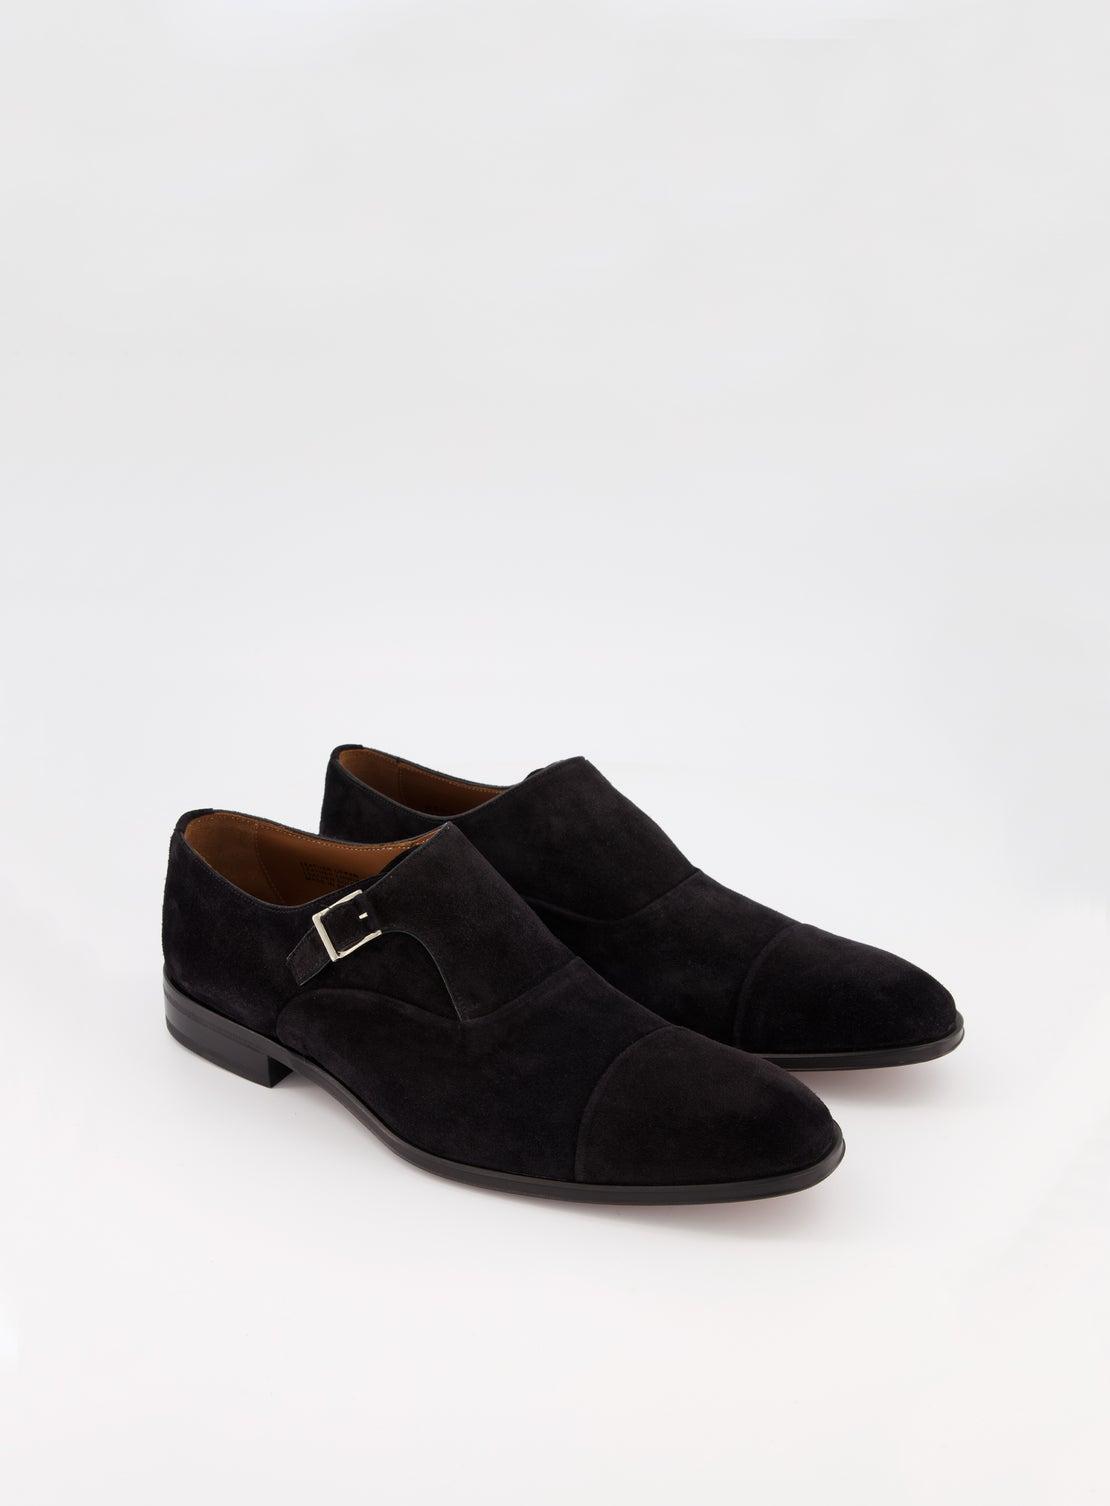 Black Suede Single Monk Toe Cap